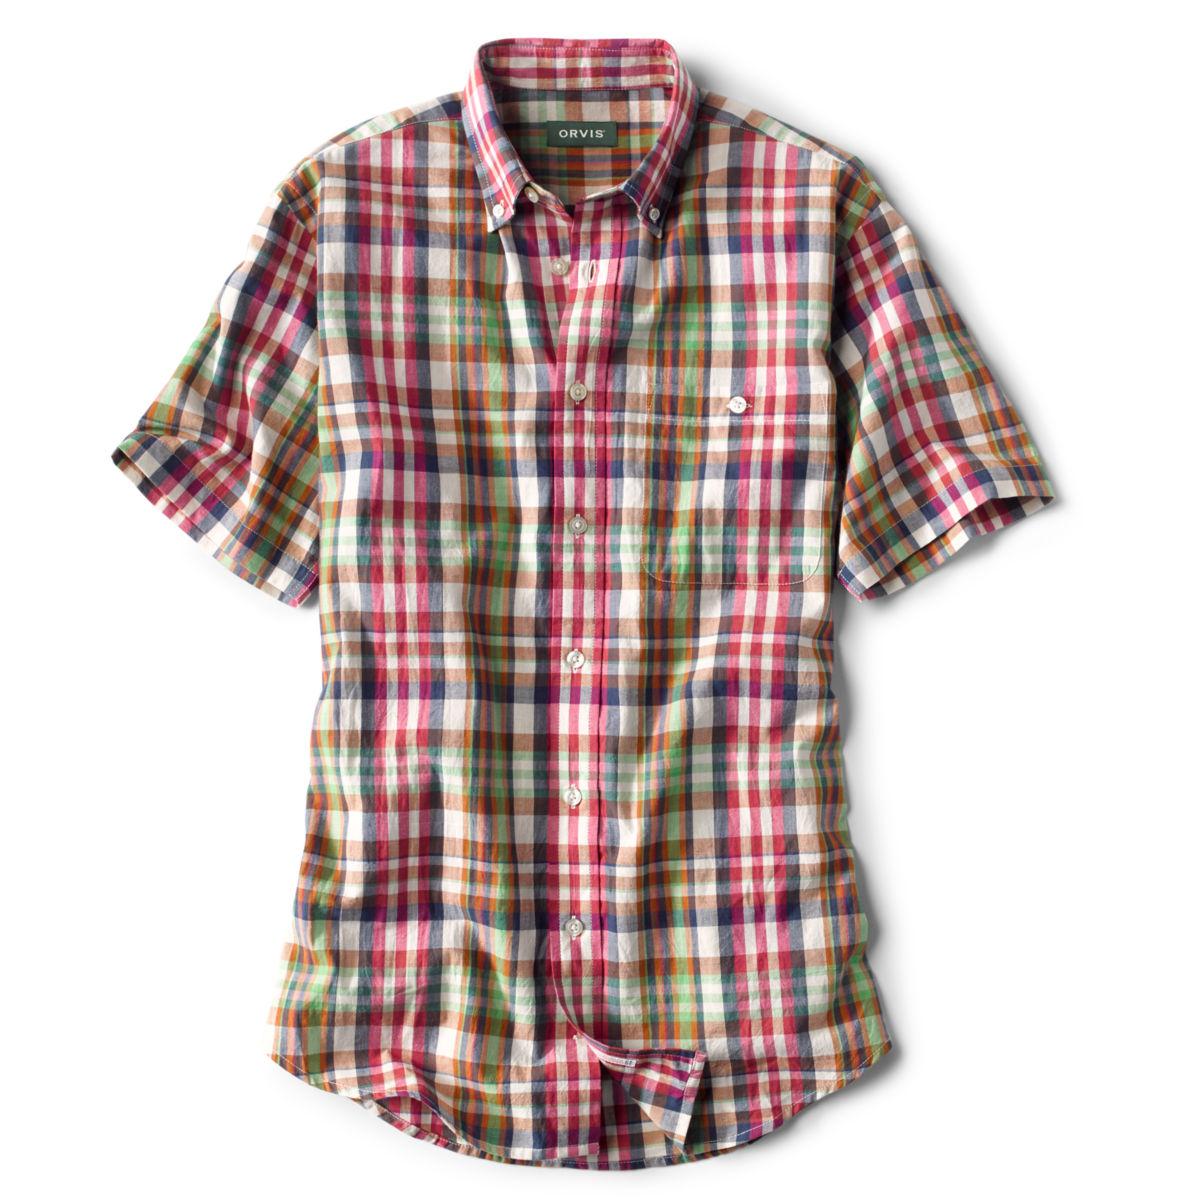 Signature Madras Short-Sleeved Shirt - NATURALimage number 0